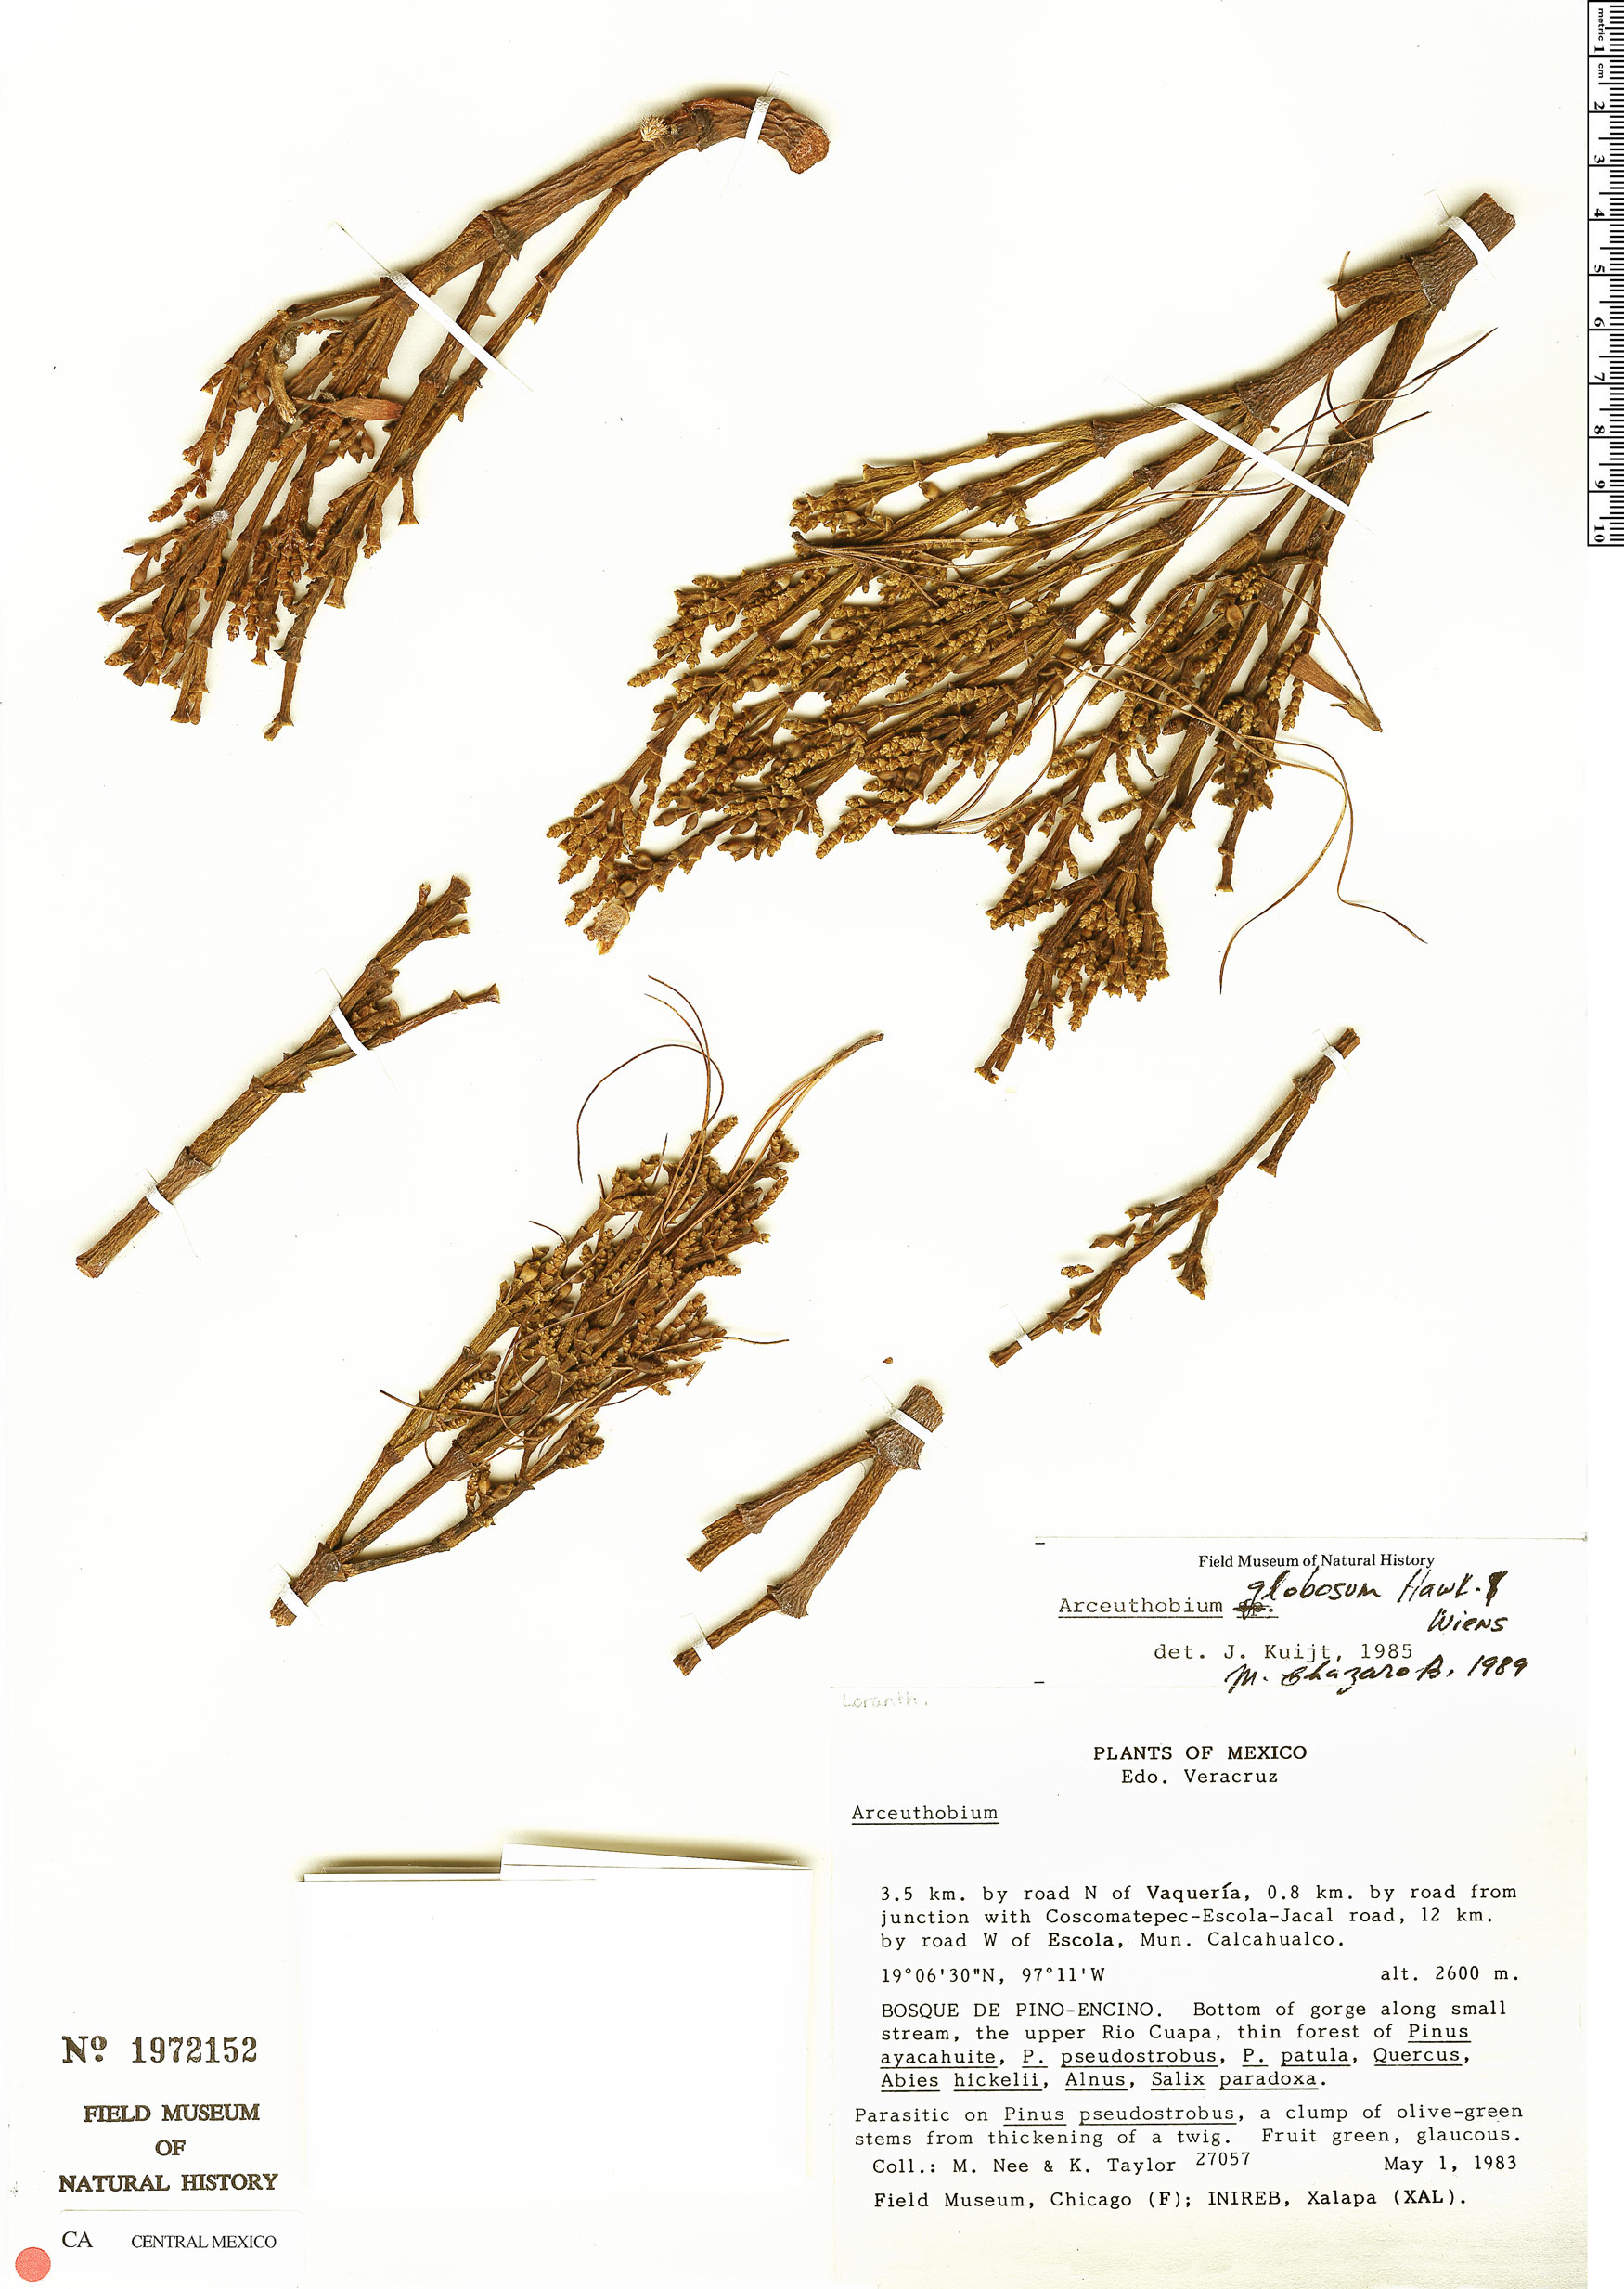 Arceuthobium globosum image